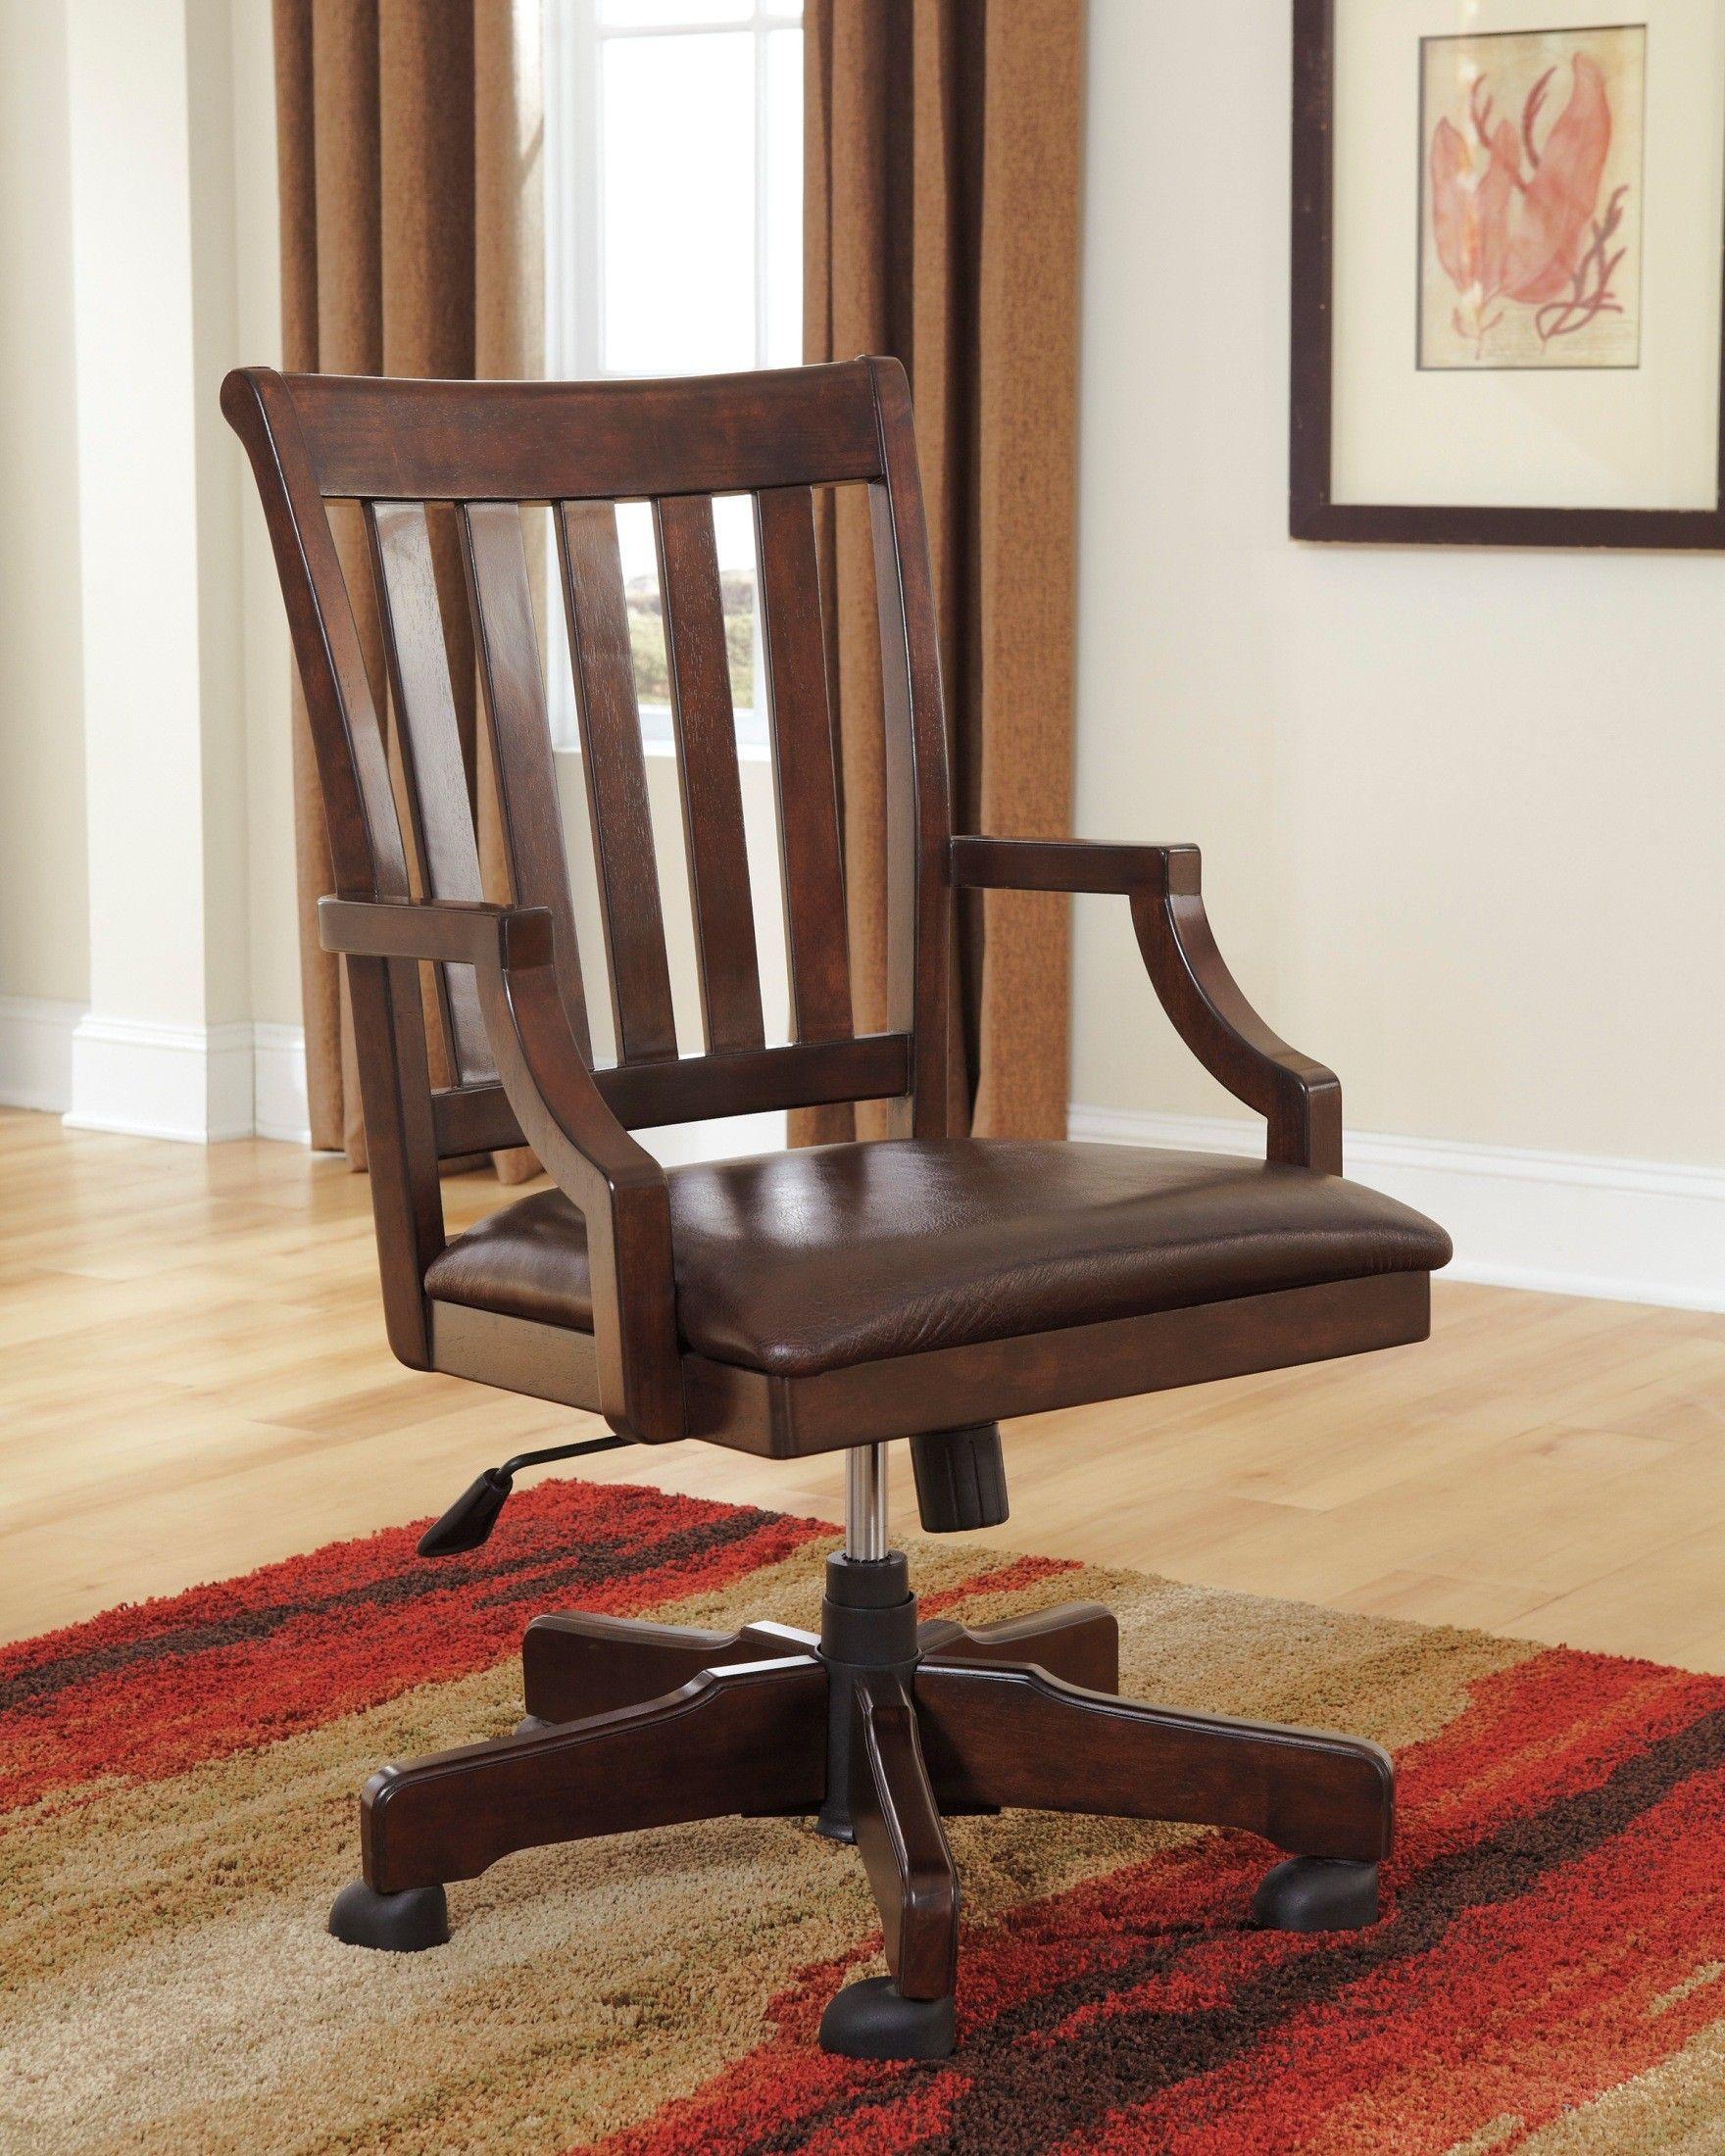 wooden swivel desk chair. Hindell Park Dark Brown Upholster Wood Home Office Desk Chair Wooden Swivel